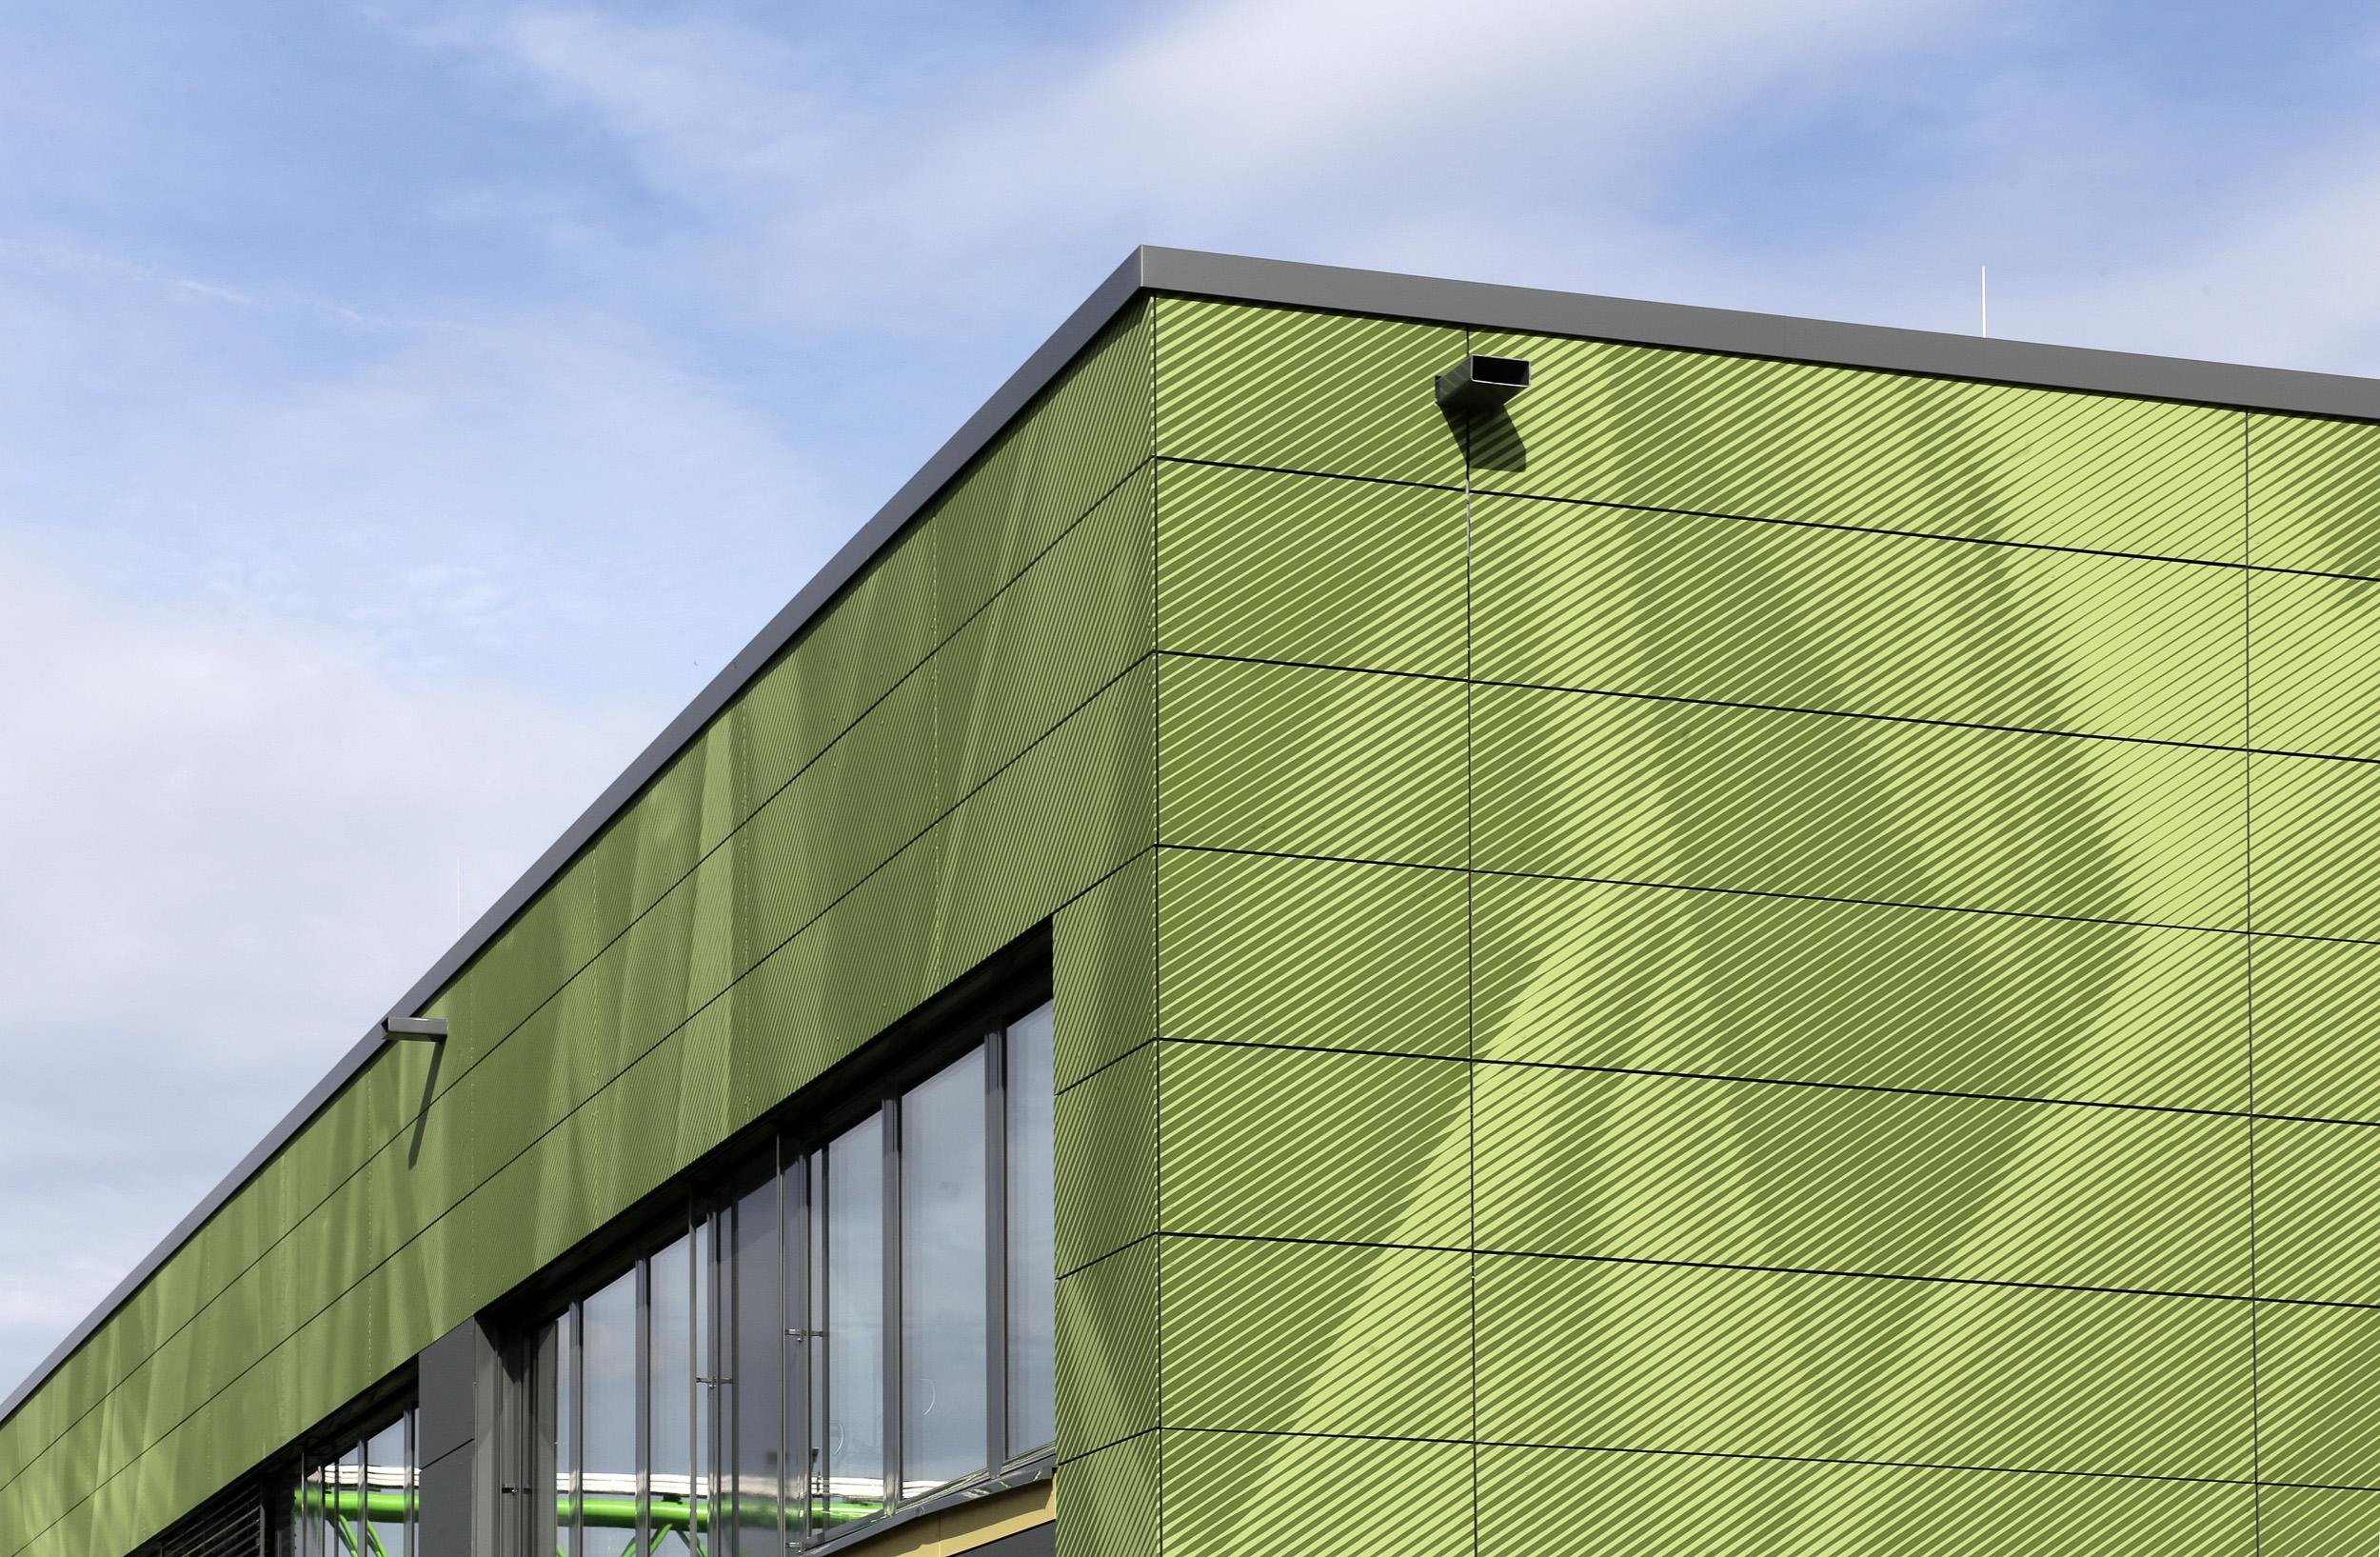 Fassadengestaltung-Industrie-Betriebszentrale-fassadenverkleidung-Bayer-Eternit-beispiel.jpg